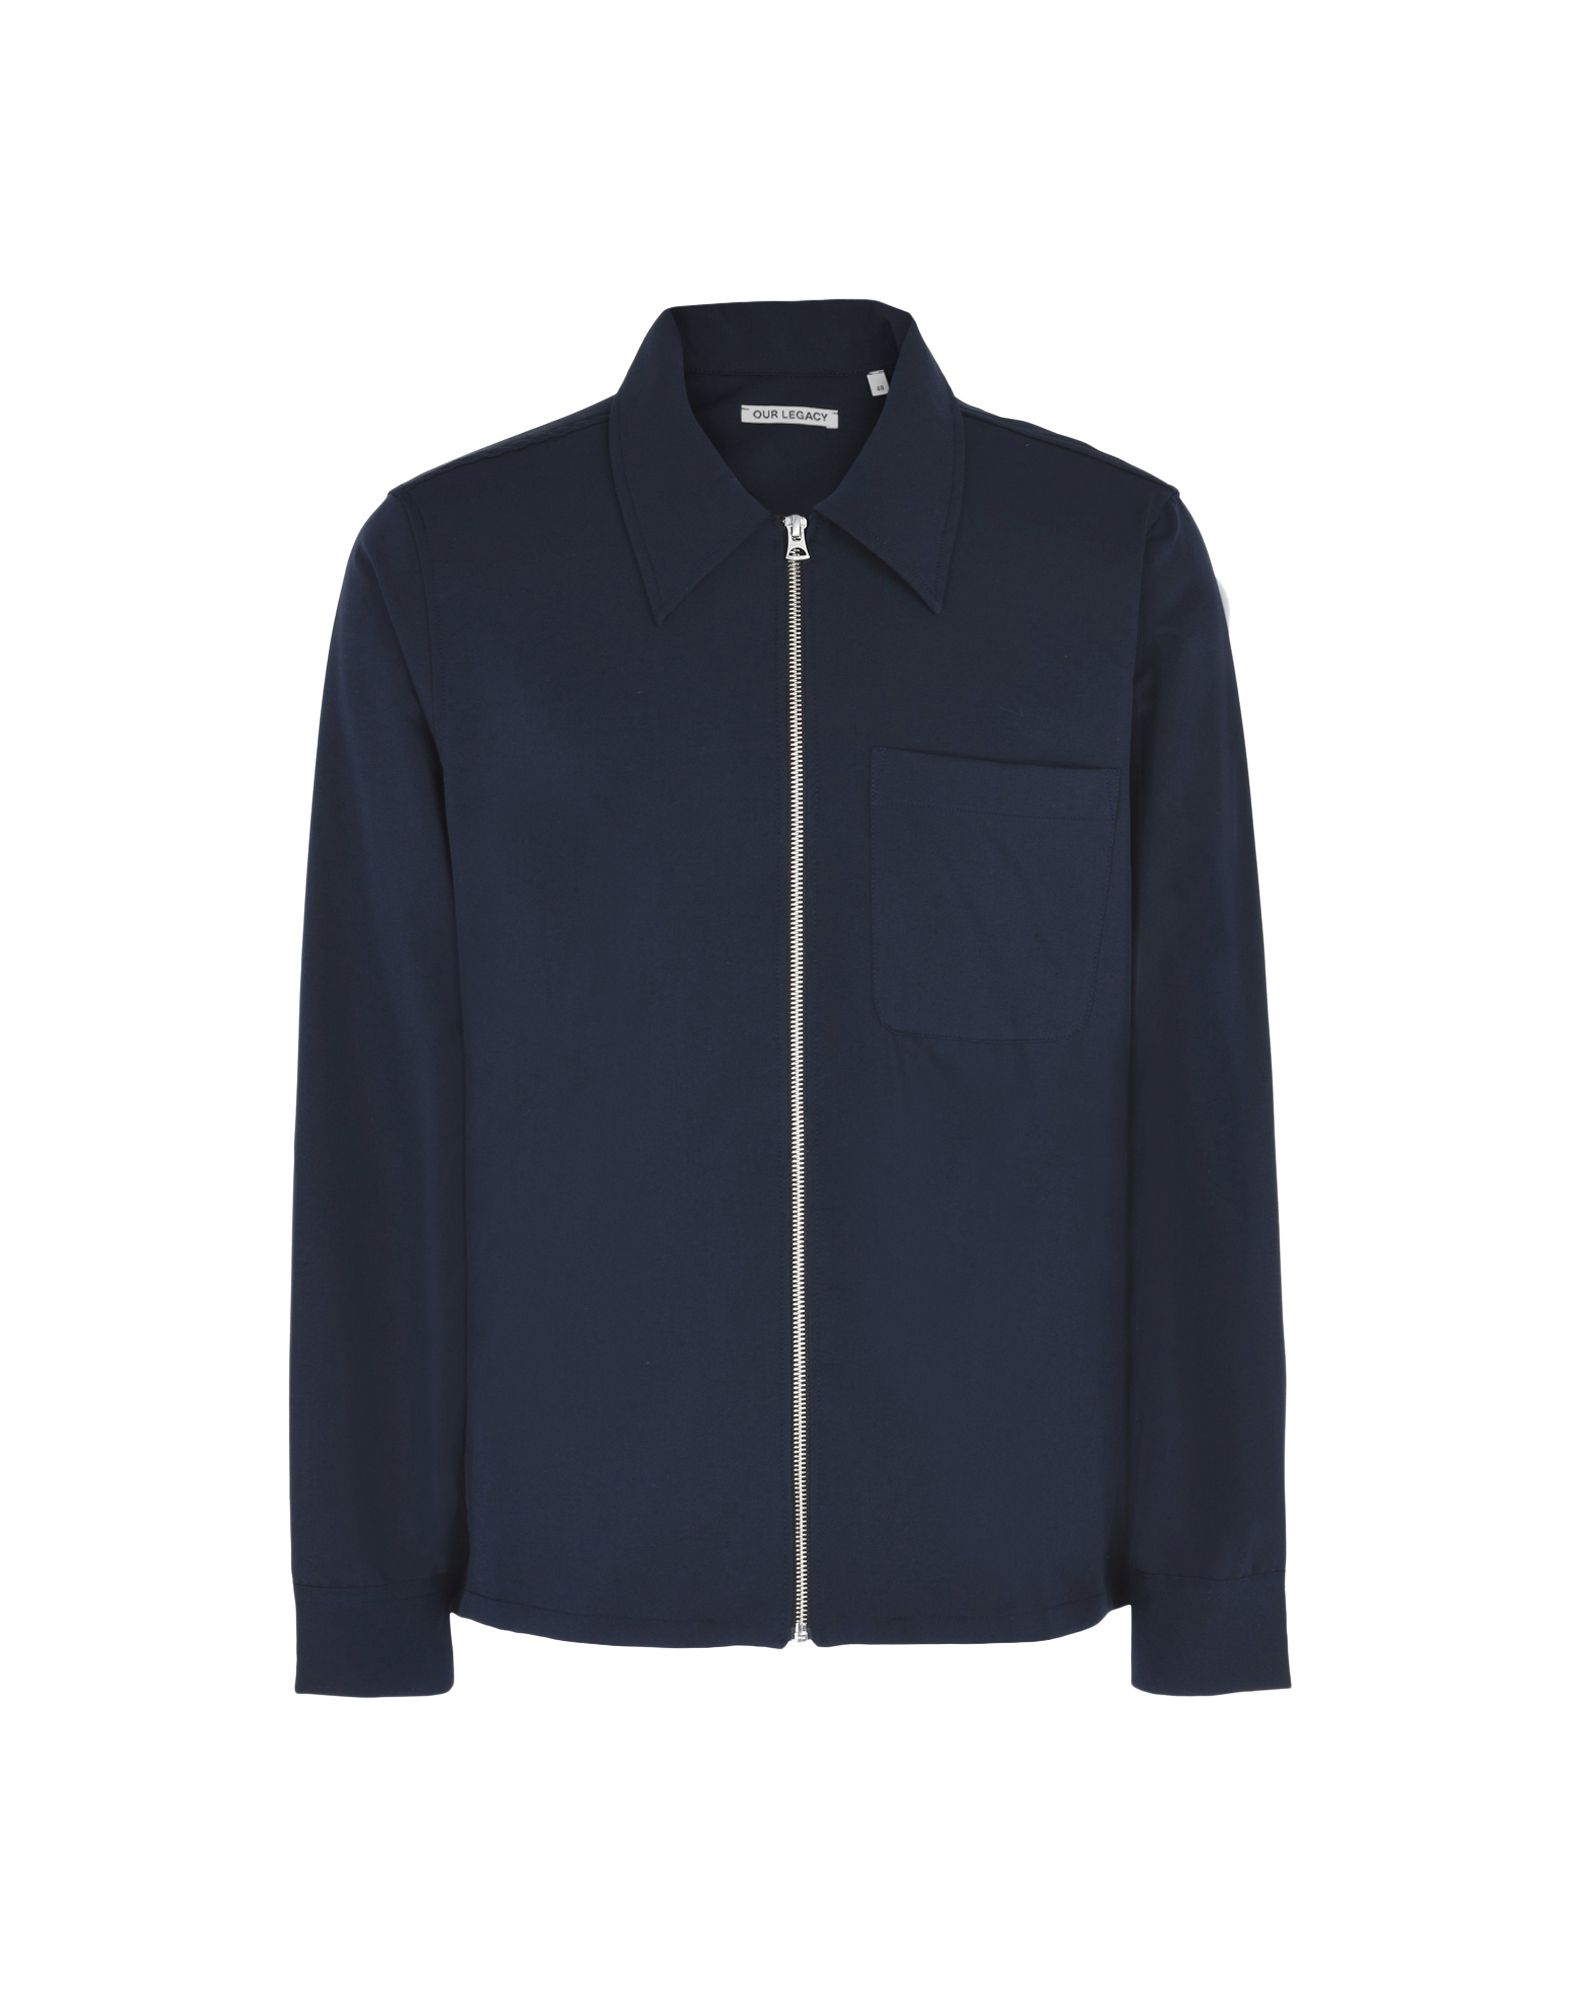 Camicia Tinta Unita Our Legacy 7300000005290 - Uomo - Acquista online su